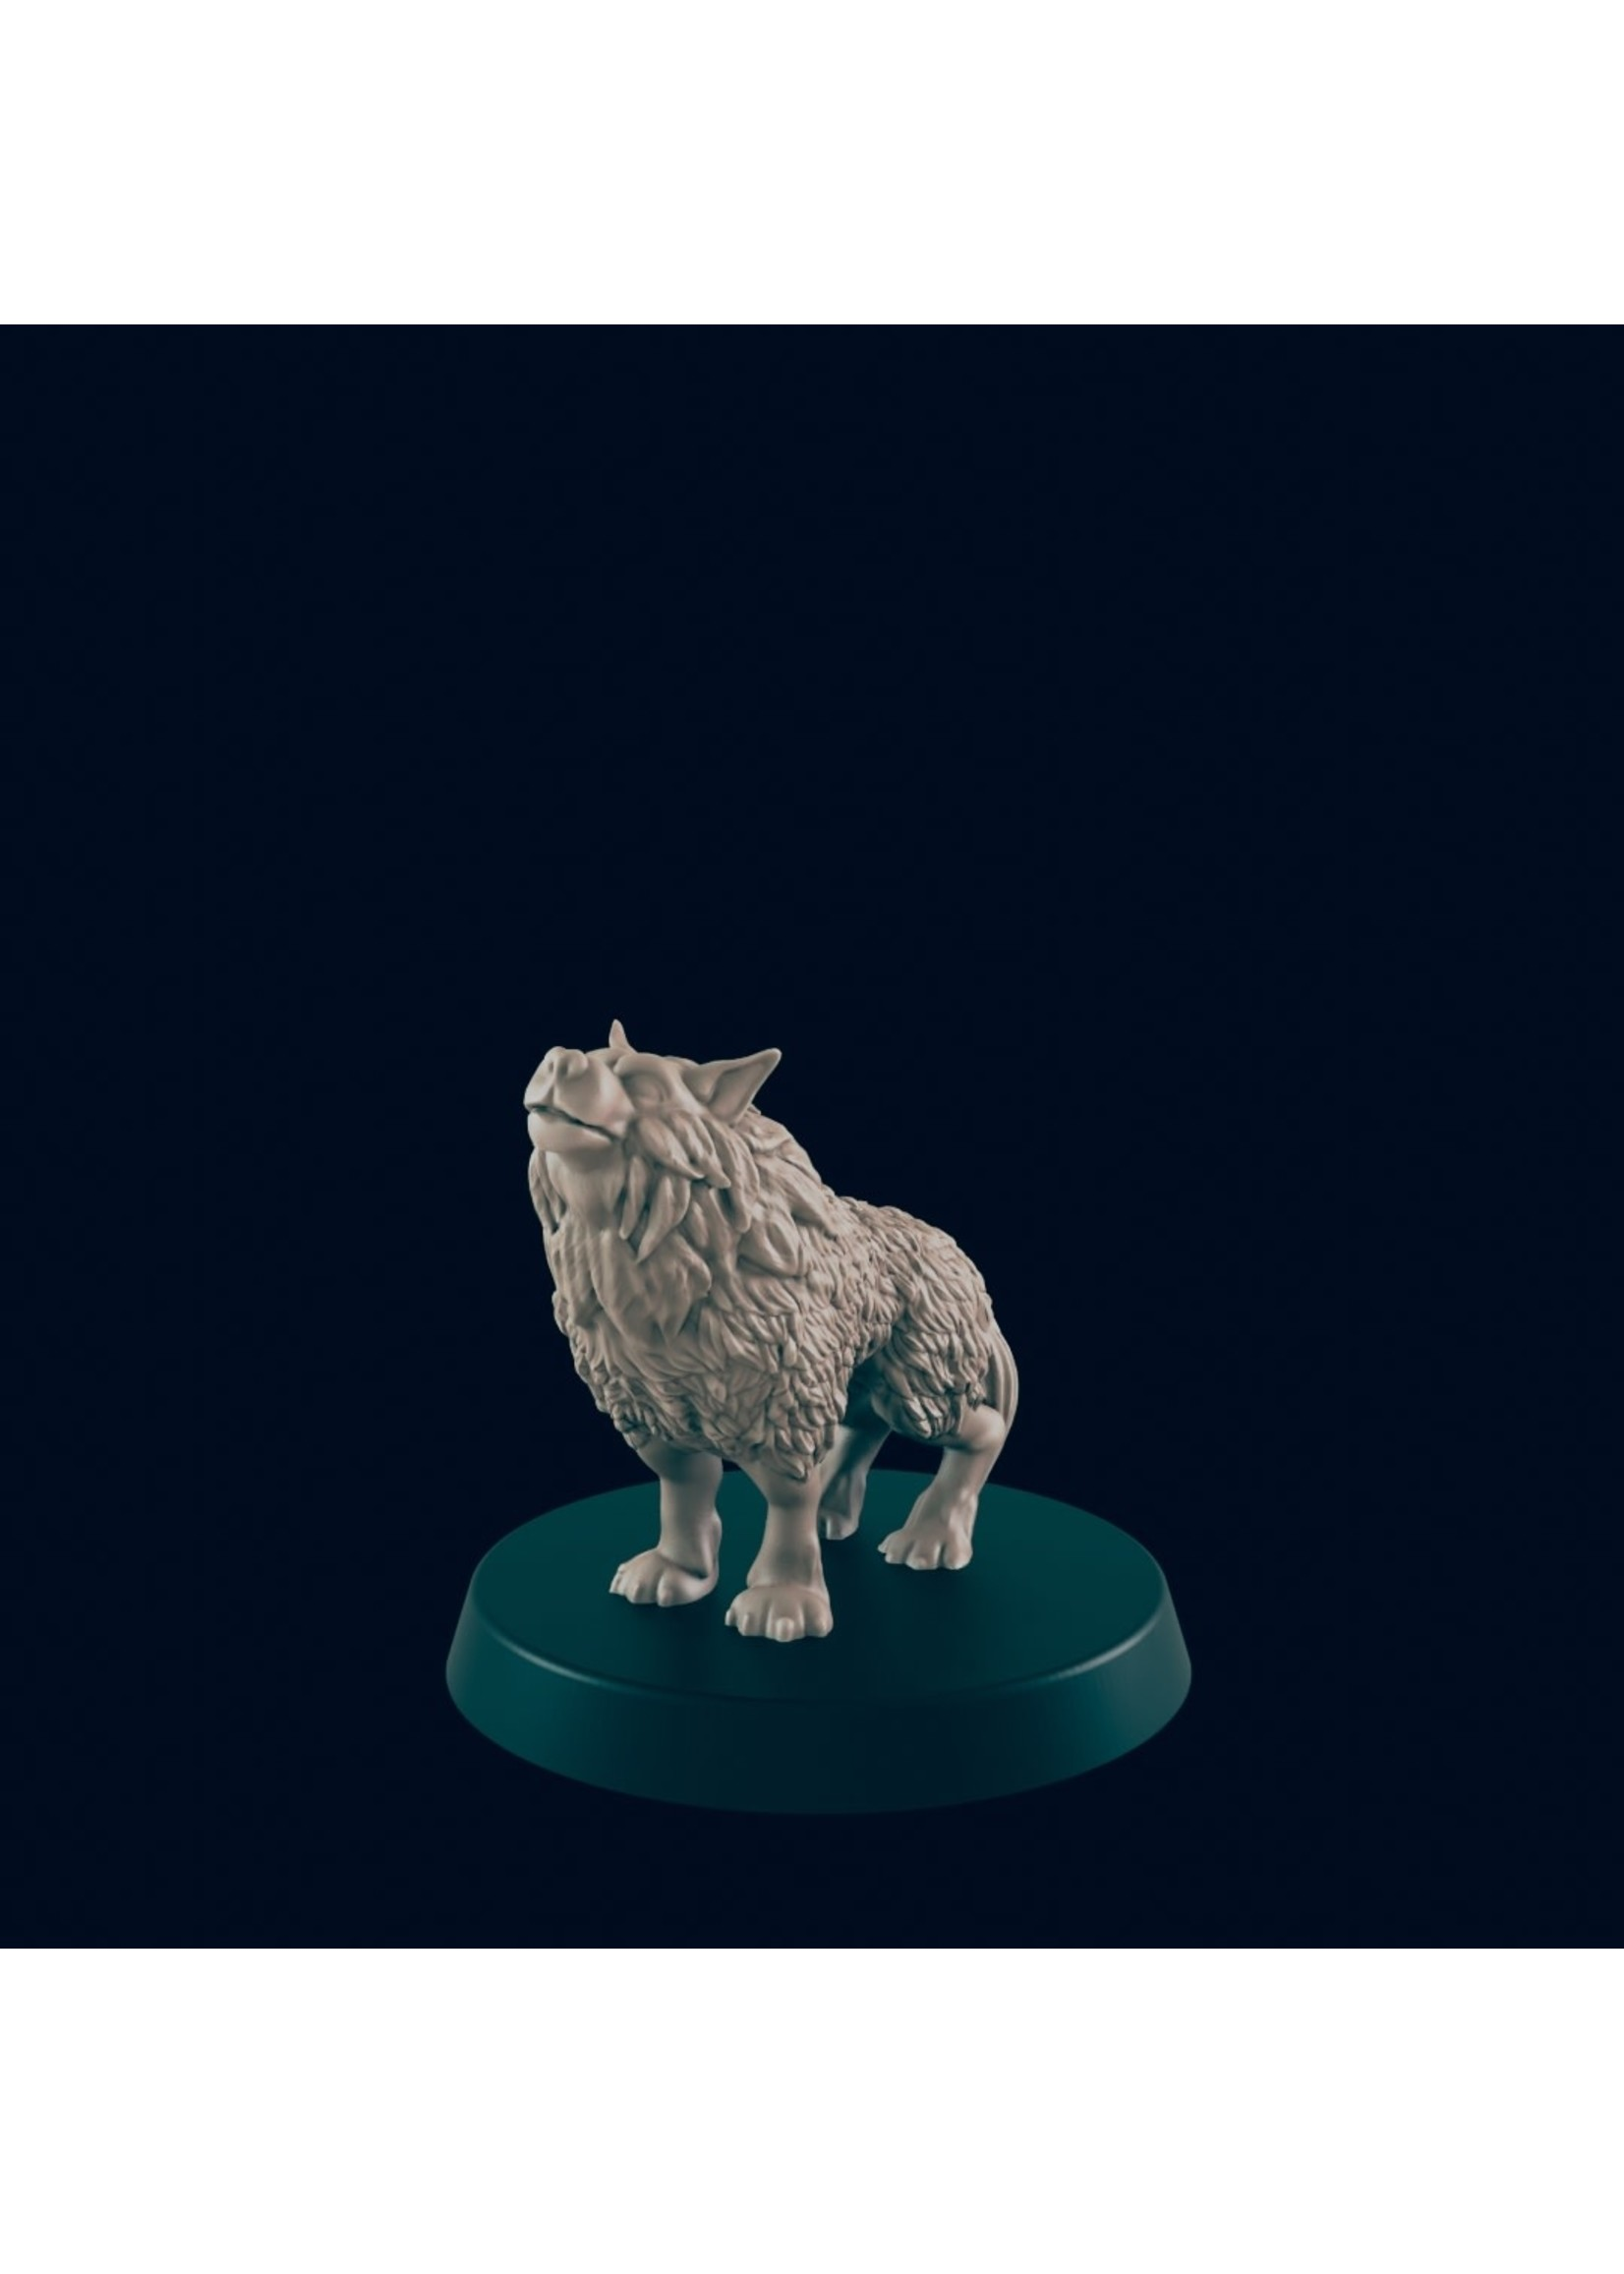 3D Printed Miniature - Wolf 2 - Dungeons & Dragons - Beasts and Baddies KS